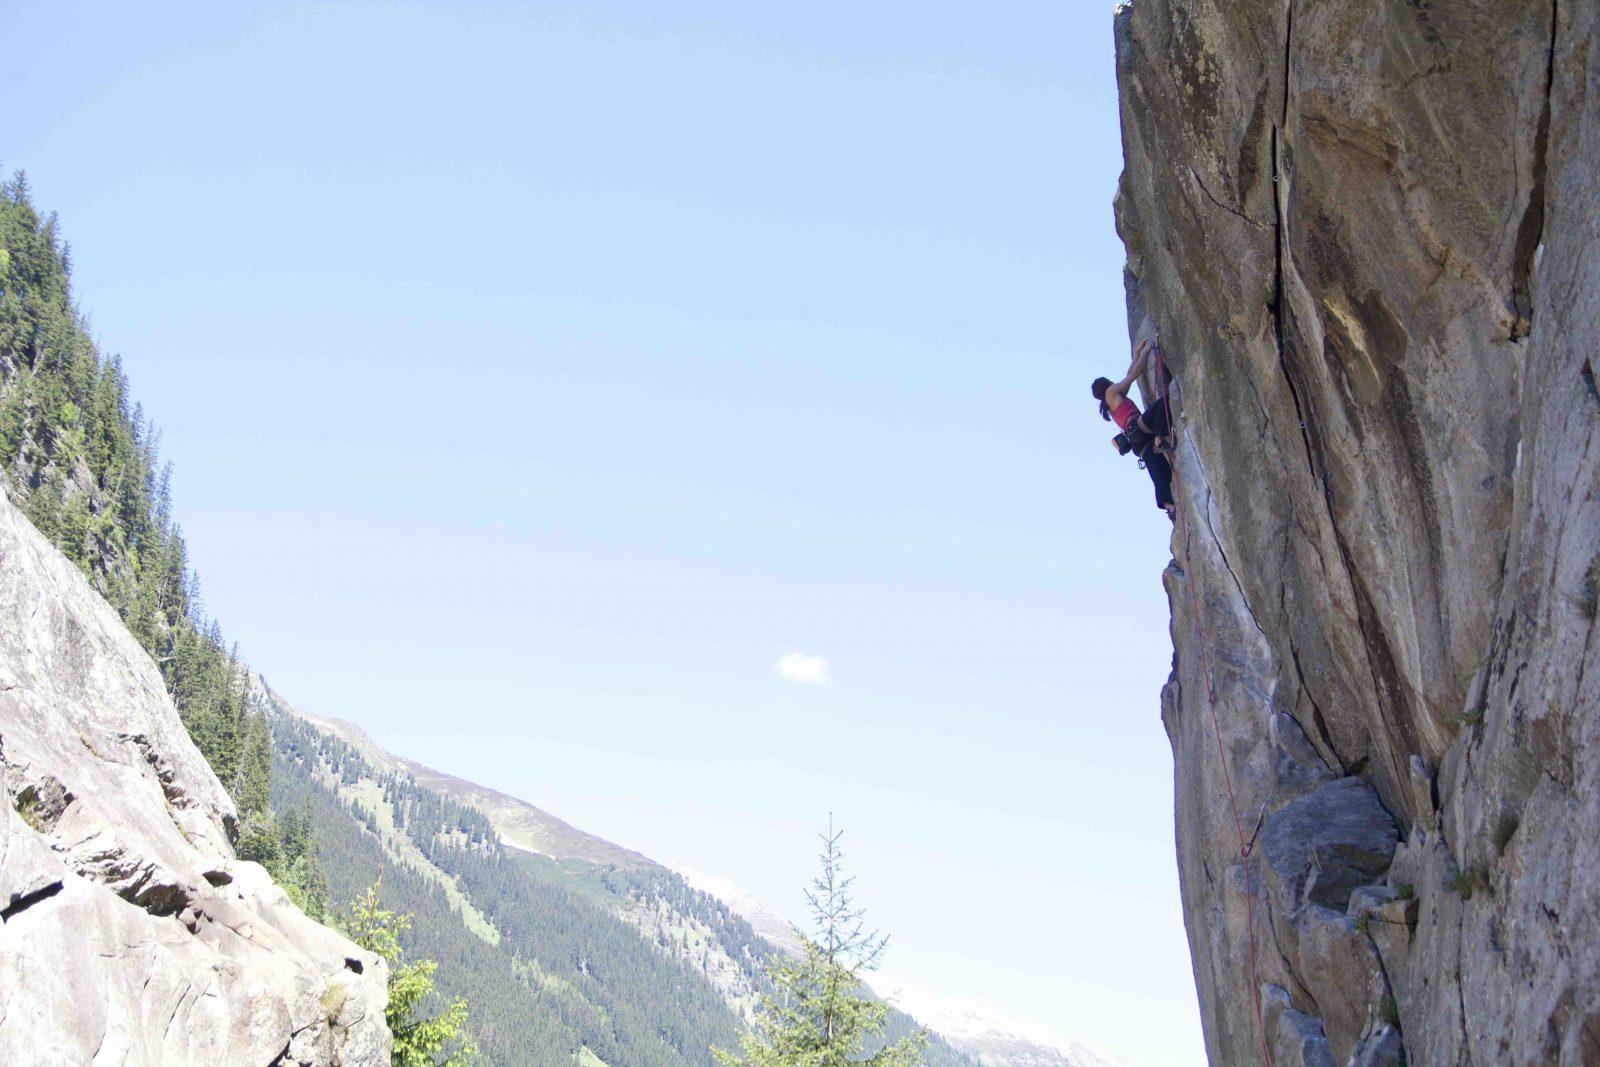 Ausdauer richtig trainieren, Foto: Martina Scheichl |Climbers Paradise